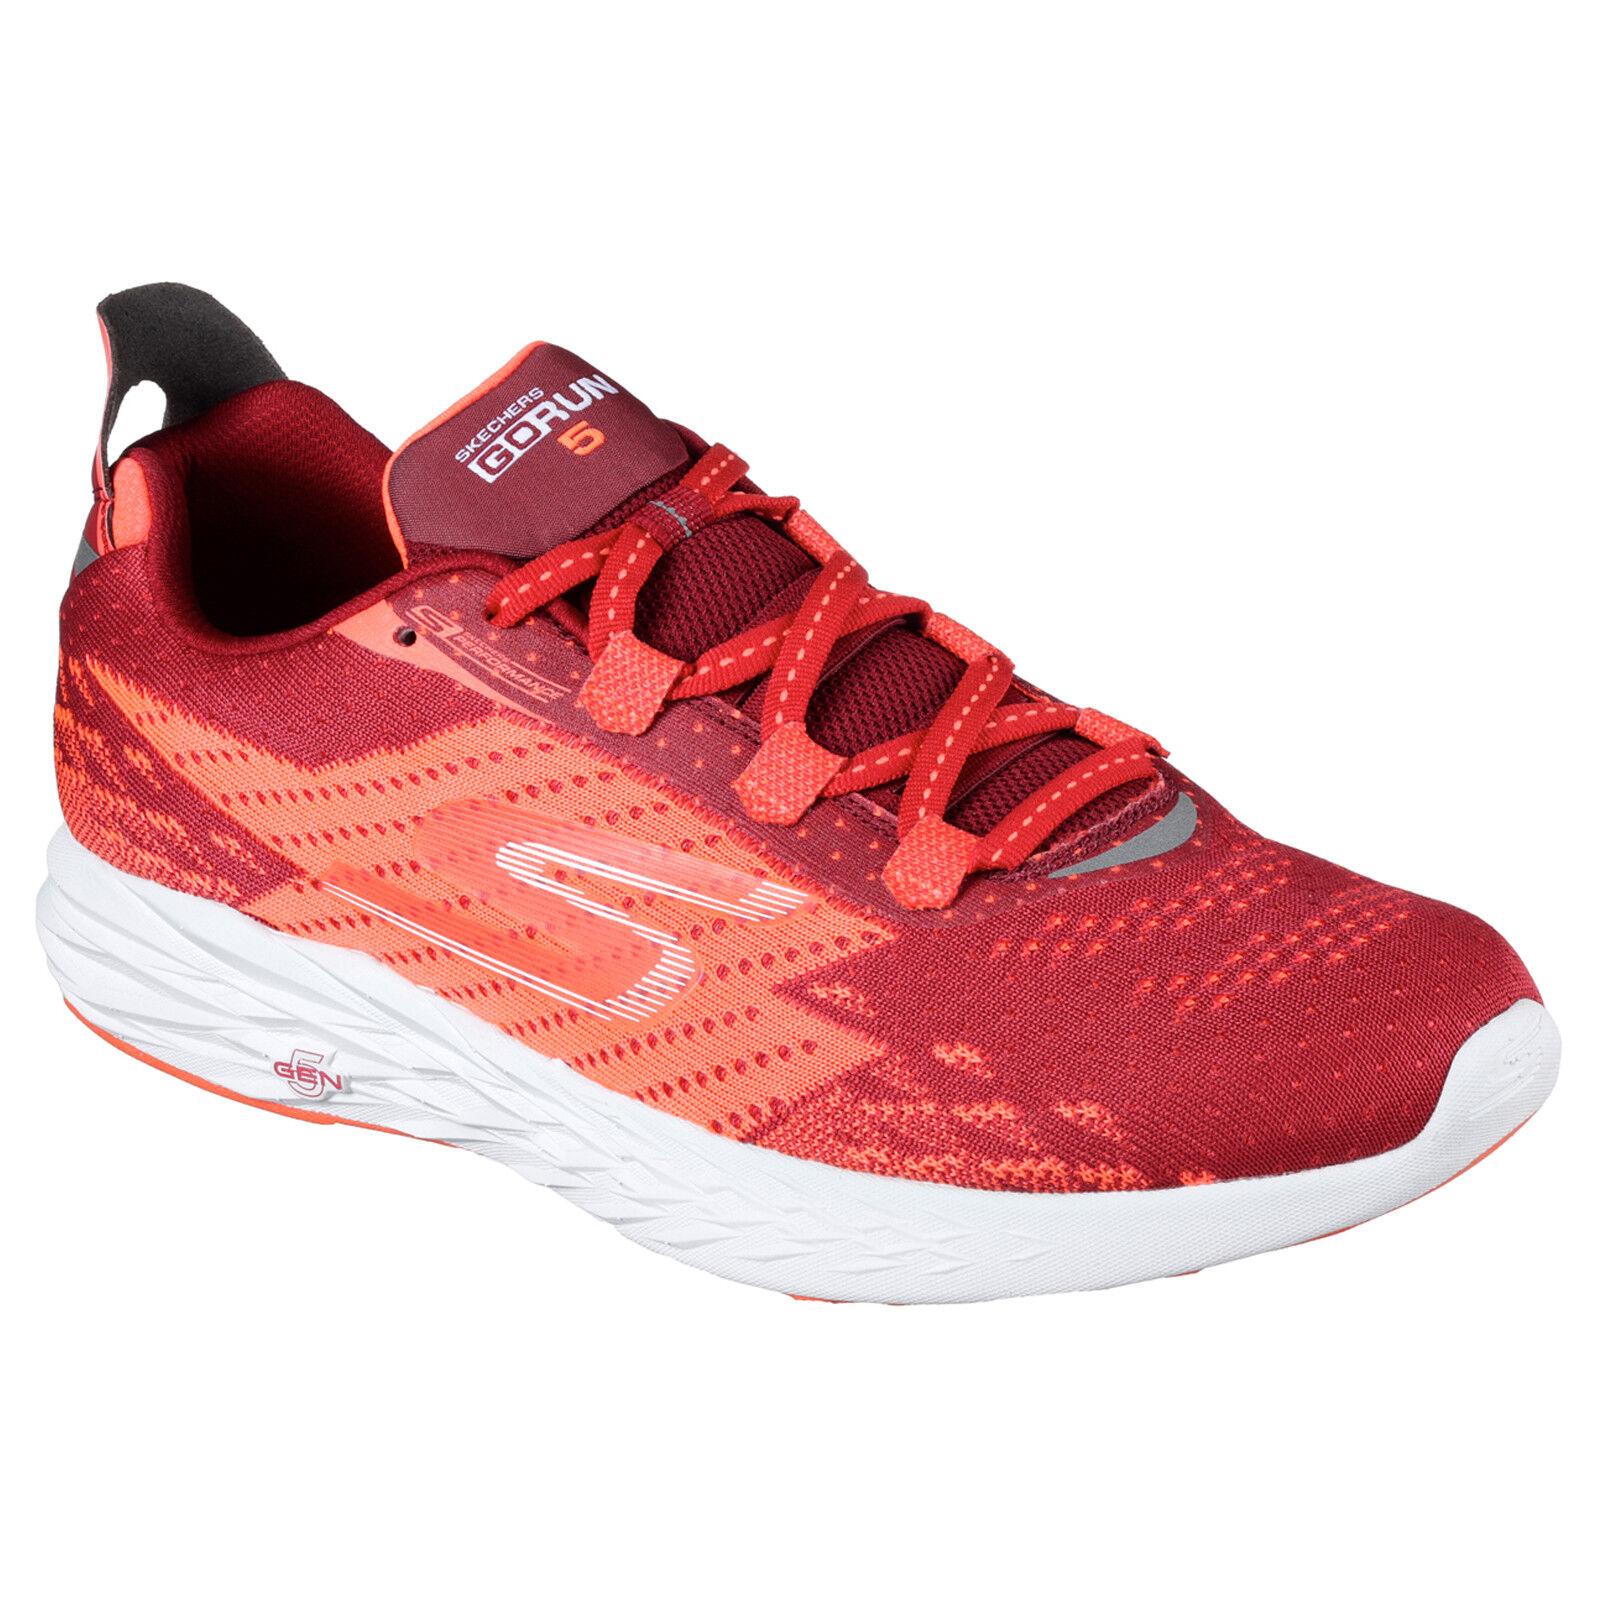 Skechers GOrun 5 shoes sportive sport corsa Memory Foam men da ginnastica